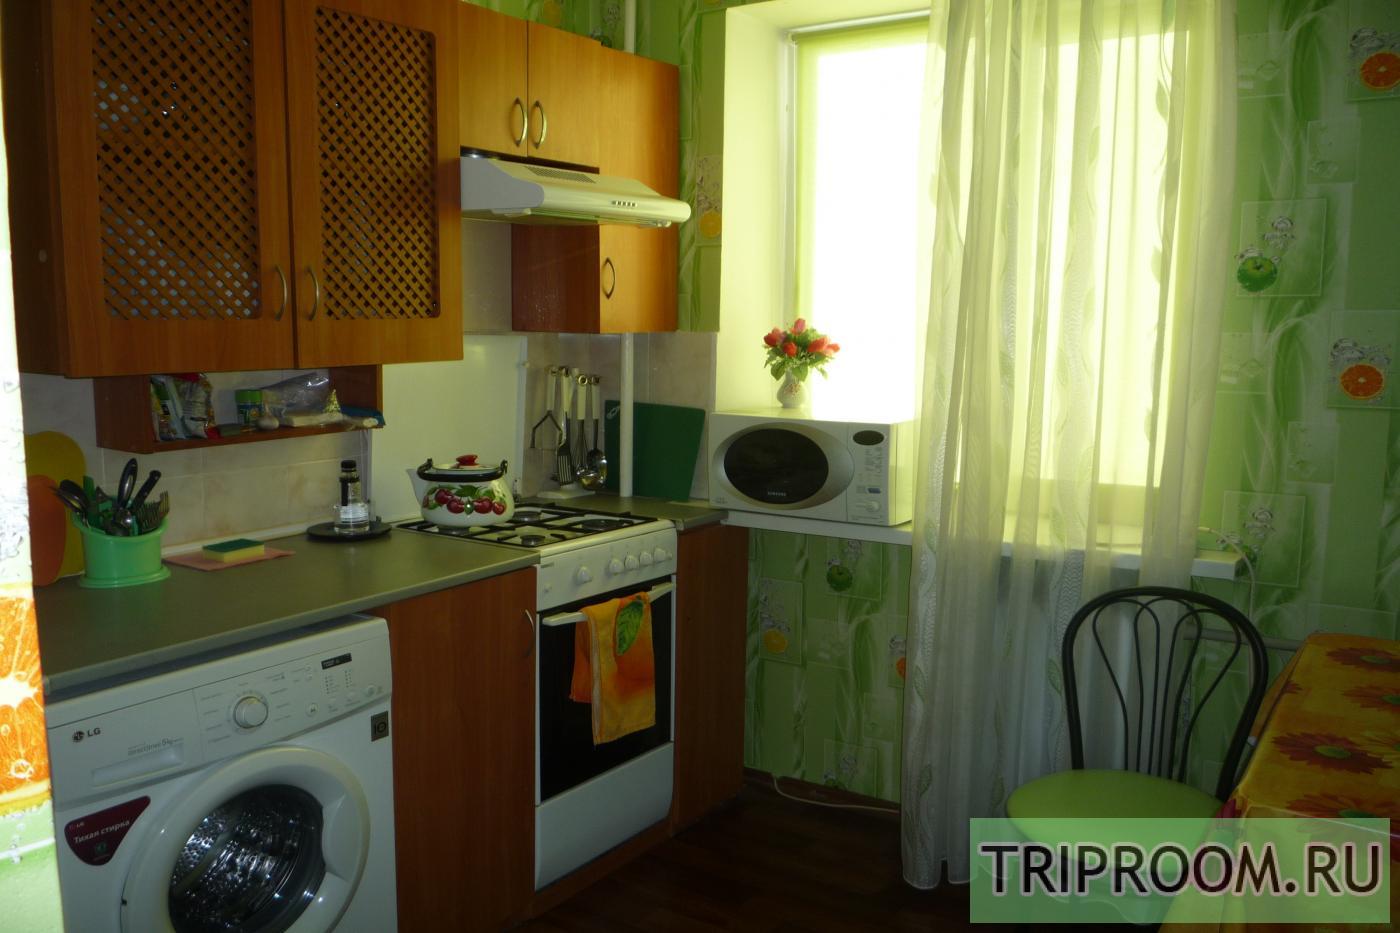 1-комнатная квартира посуточно (вариант № 13441), ул. Гагарина проспект, фото № 6